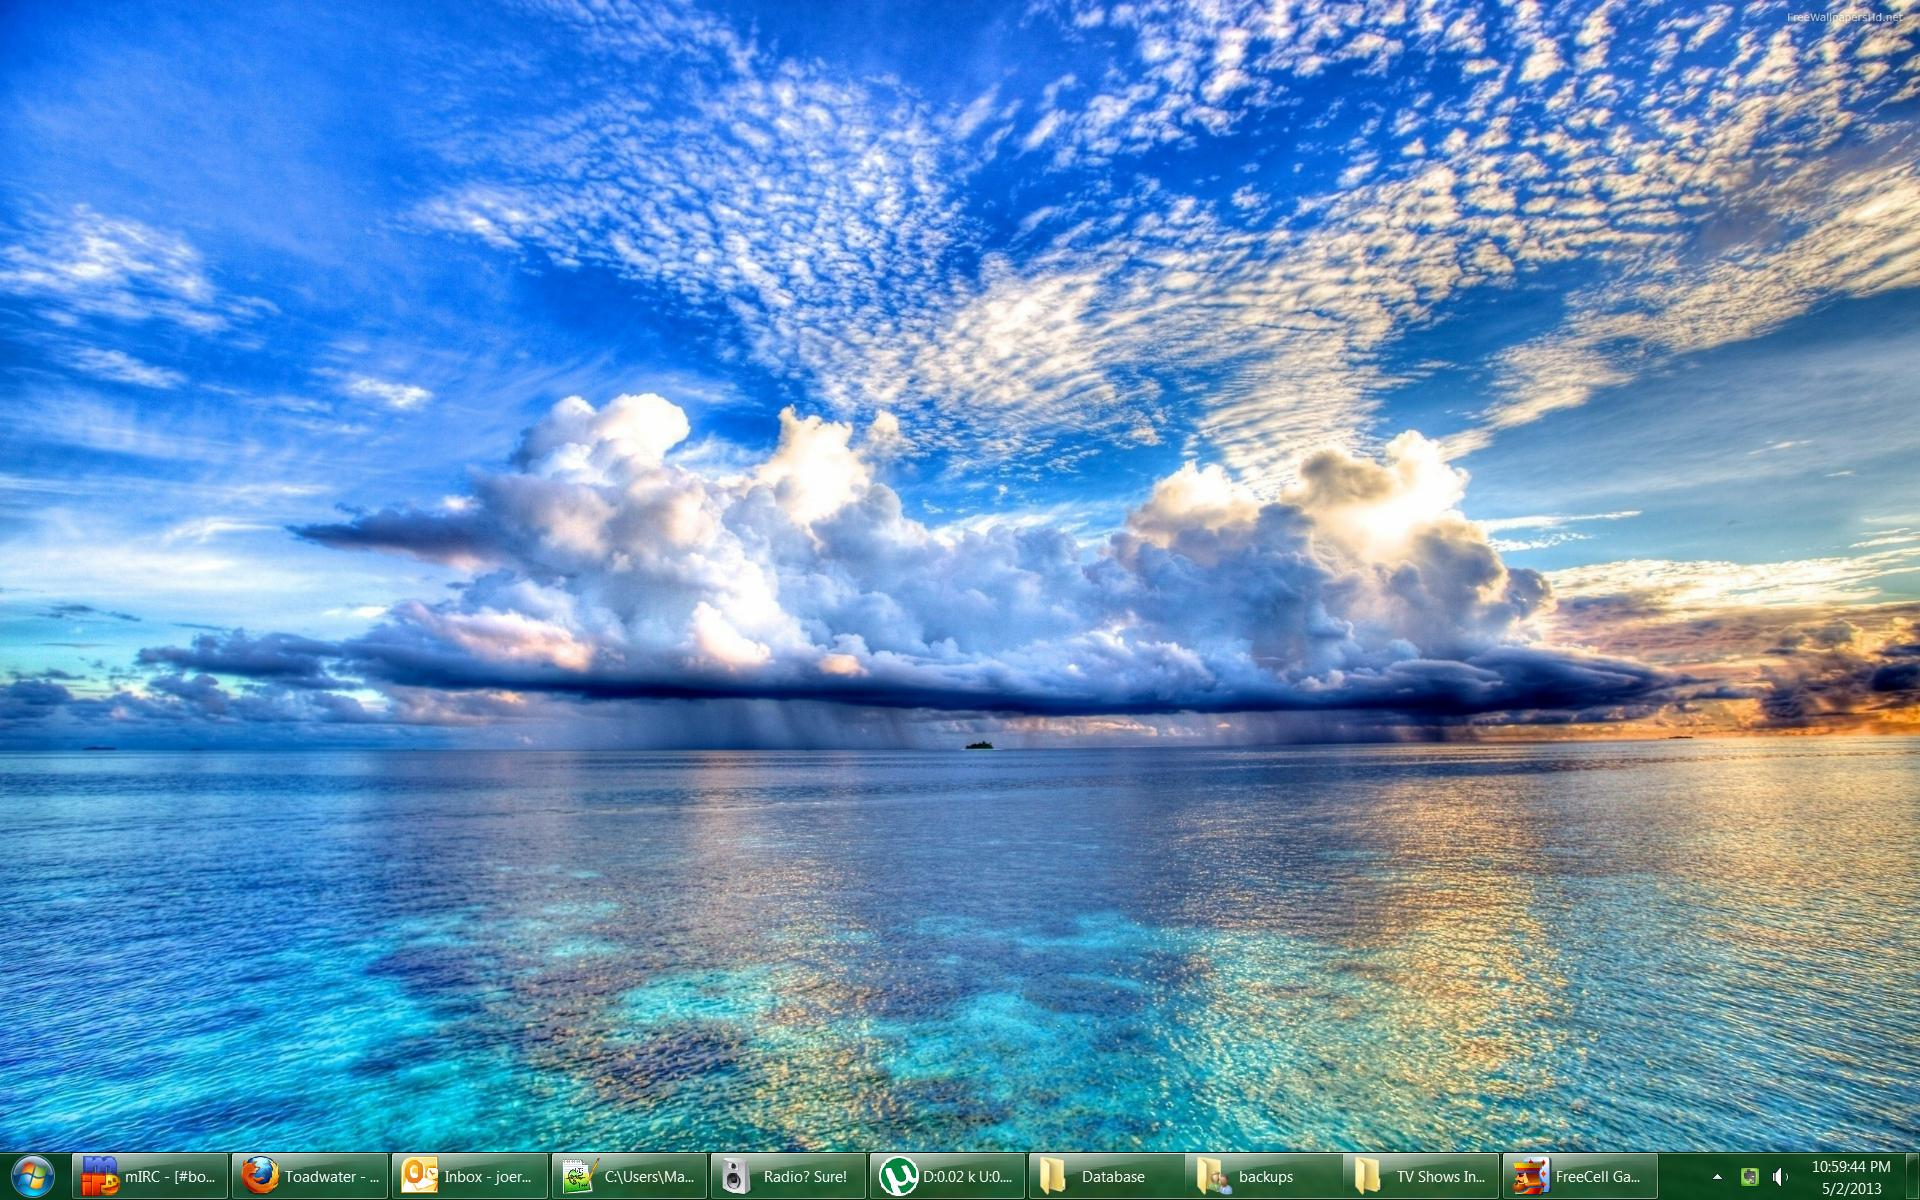 Hd Wallpaper For Desktop Relaxing